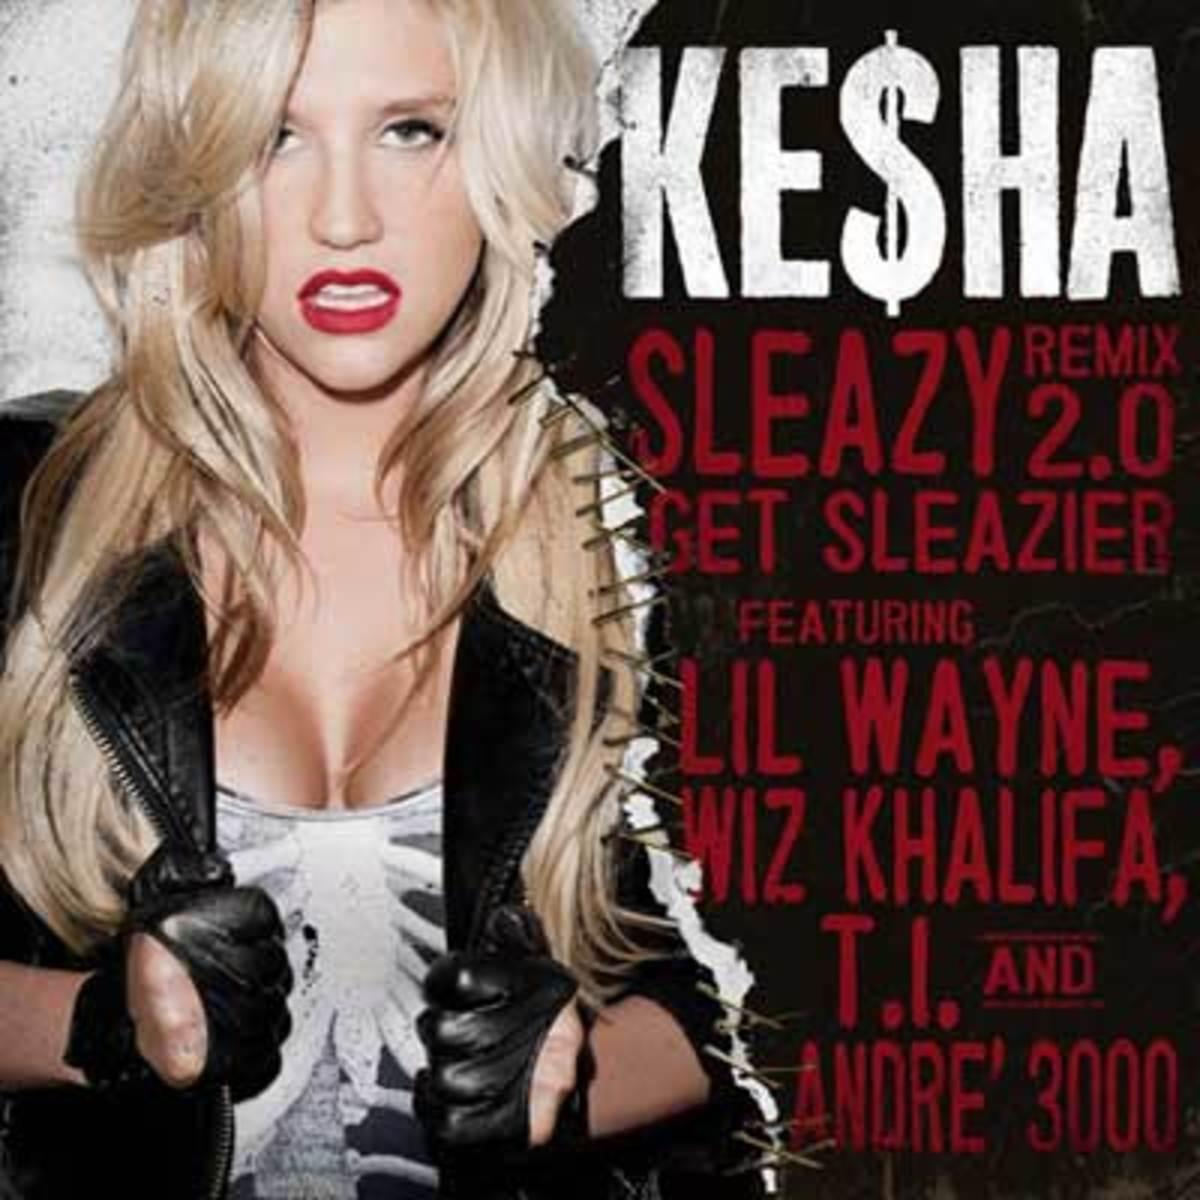 kesha-sleazy.jpg